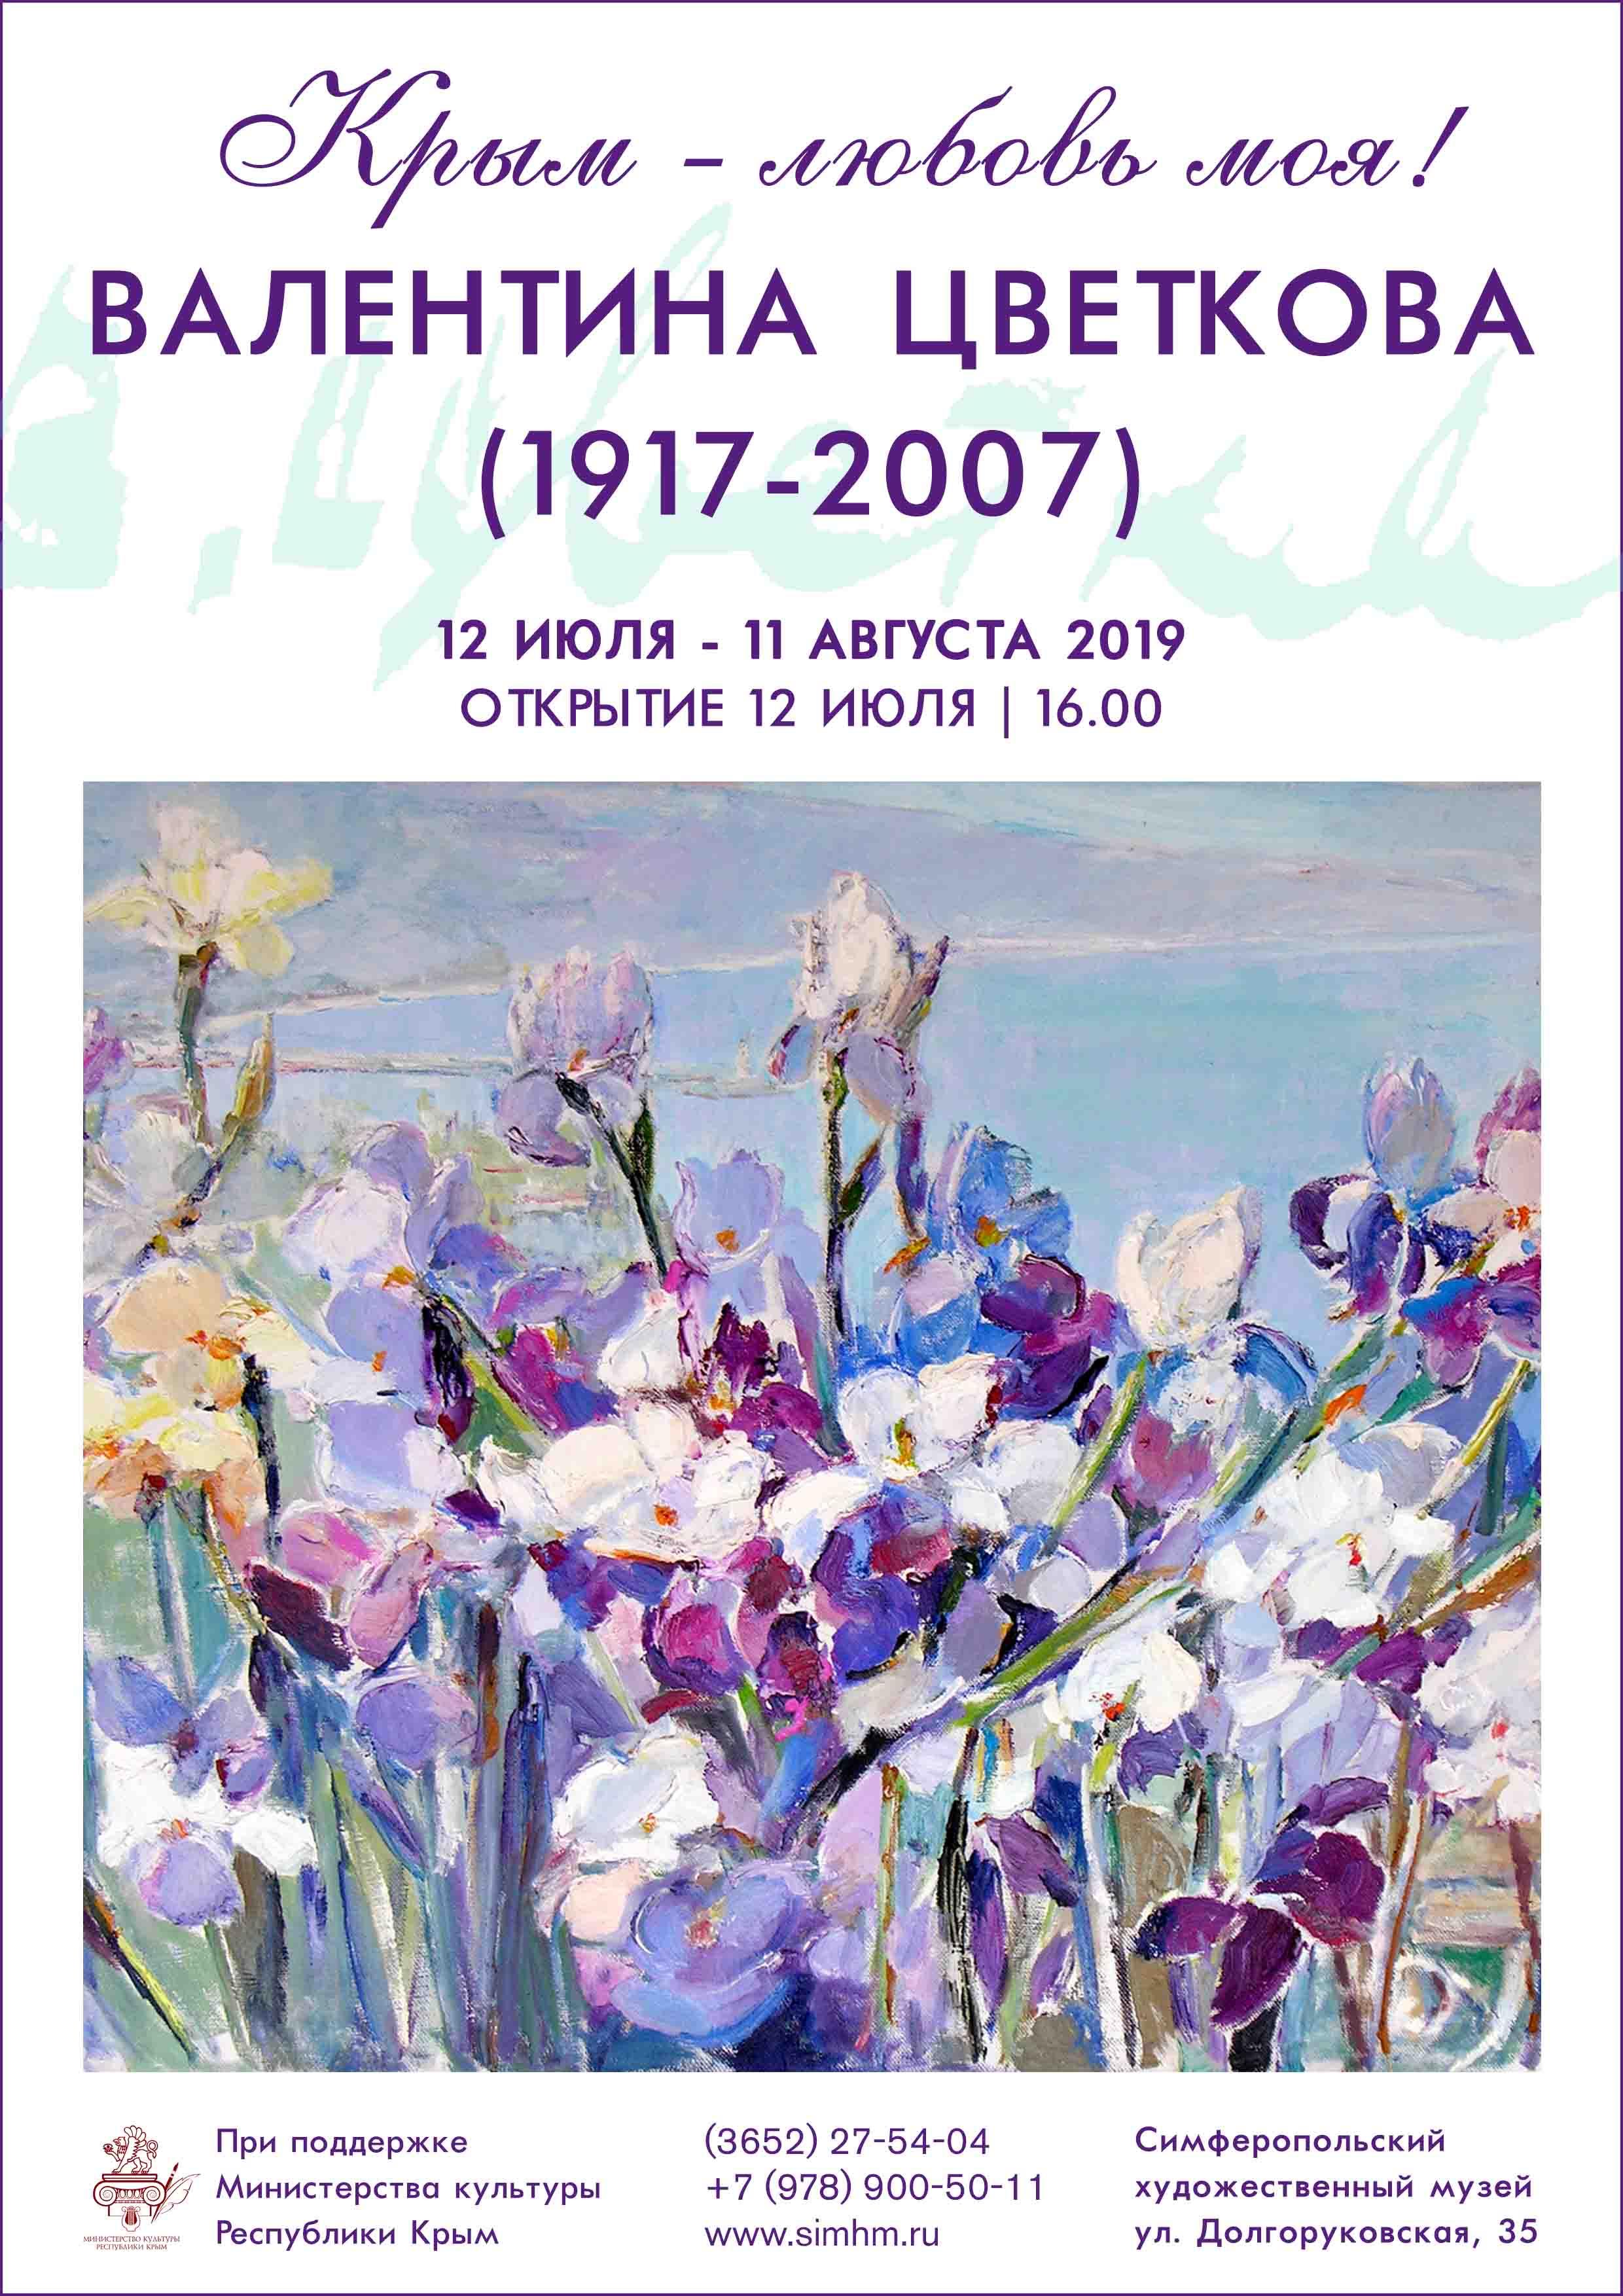 выставка в Симферополе, Валентина Цветкова, 2019